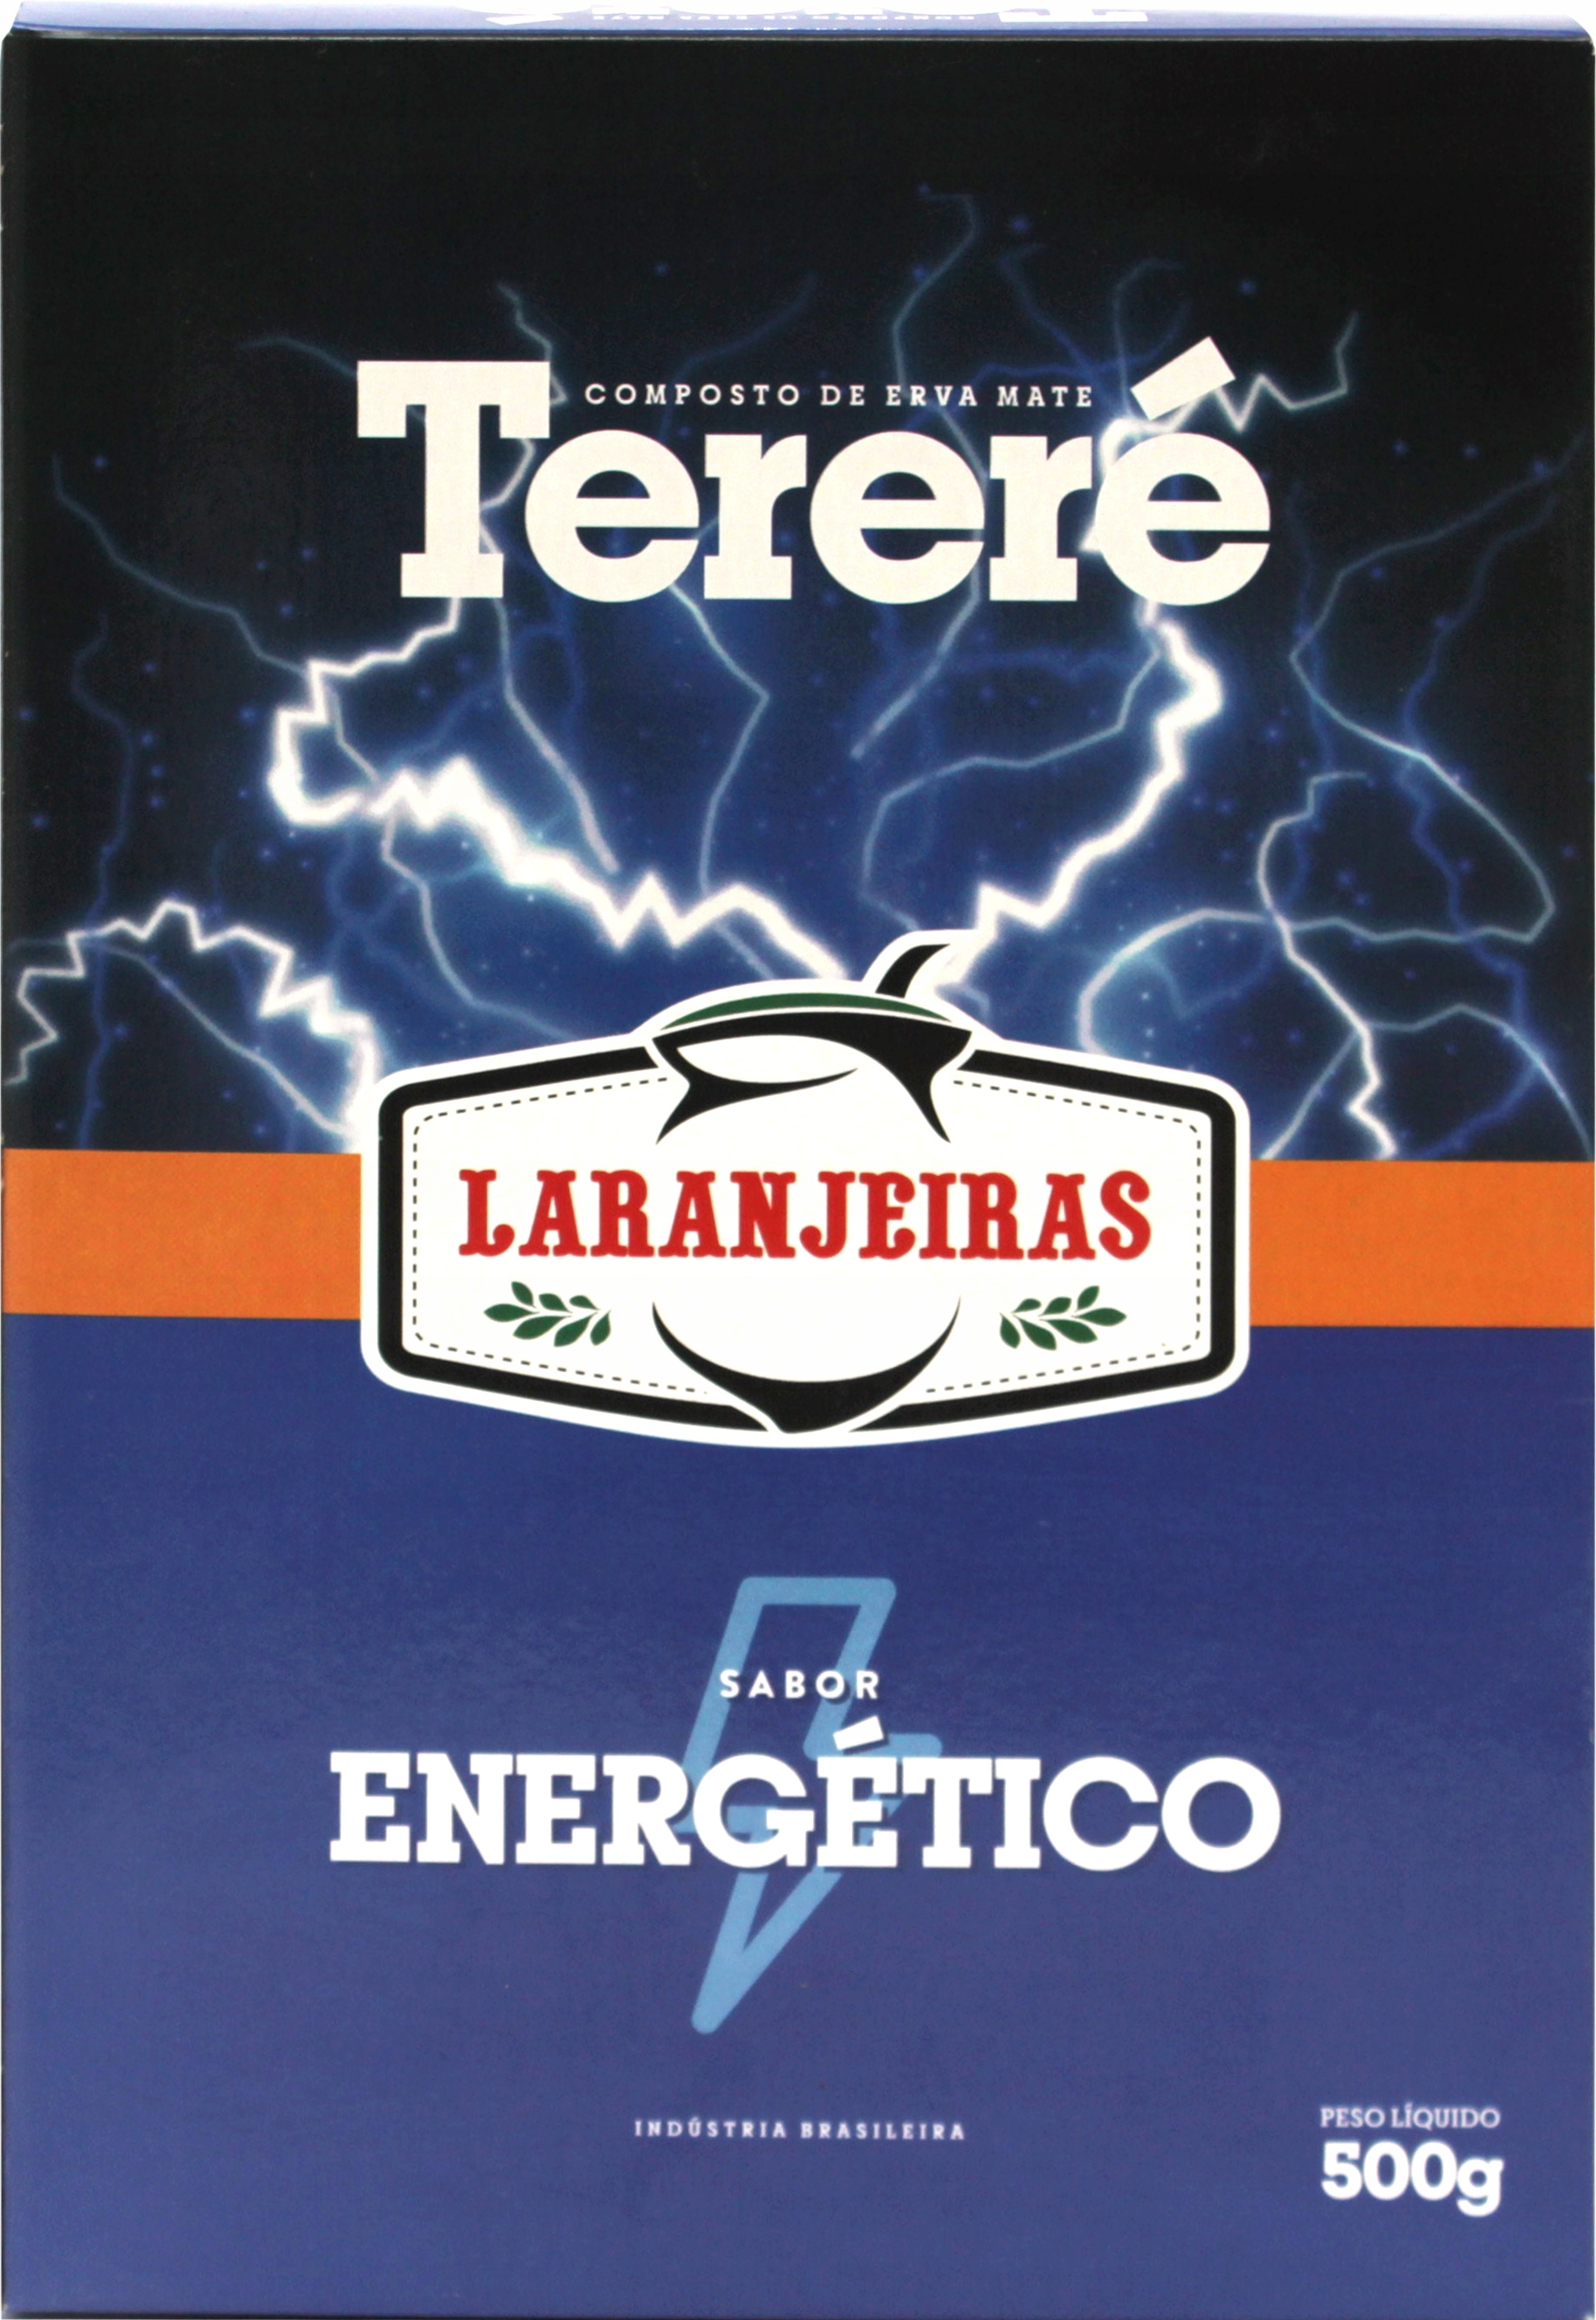 Йерба Мате Ларанжейрас Энергетико Гуарана 500г